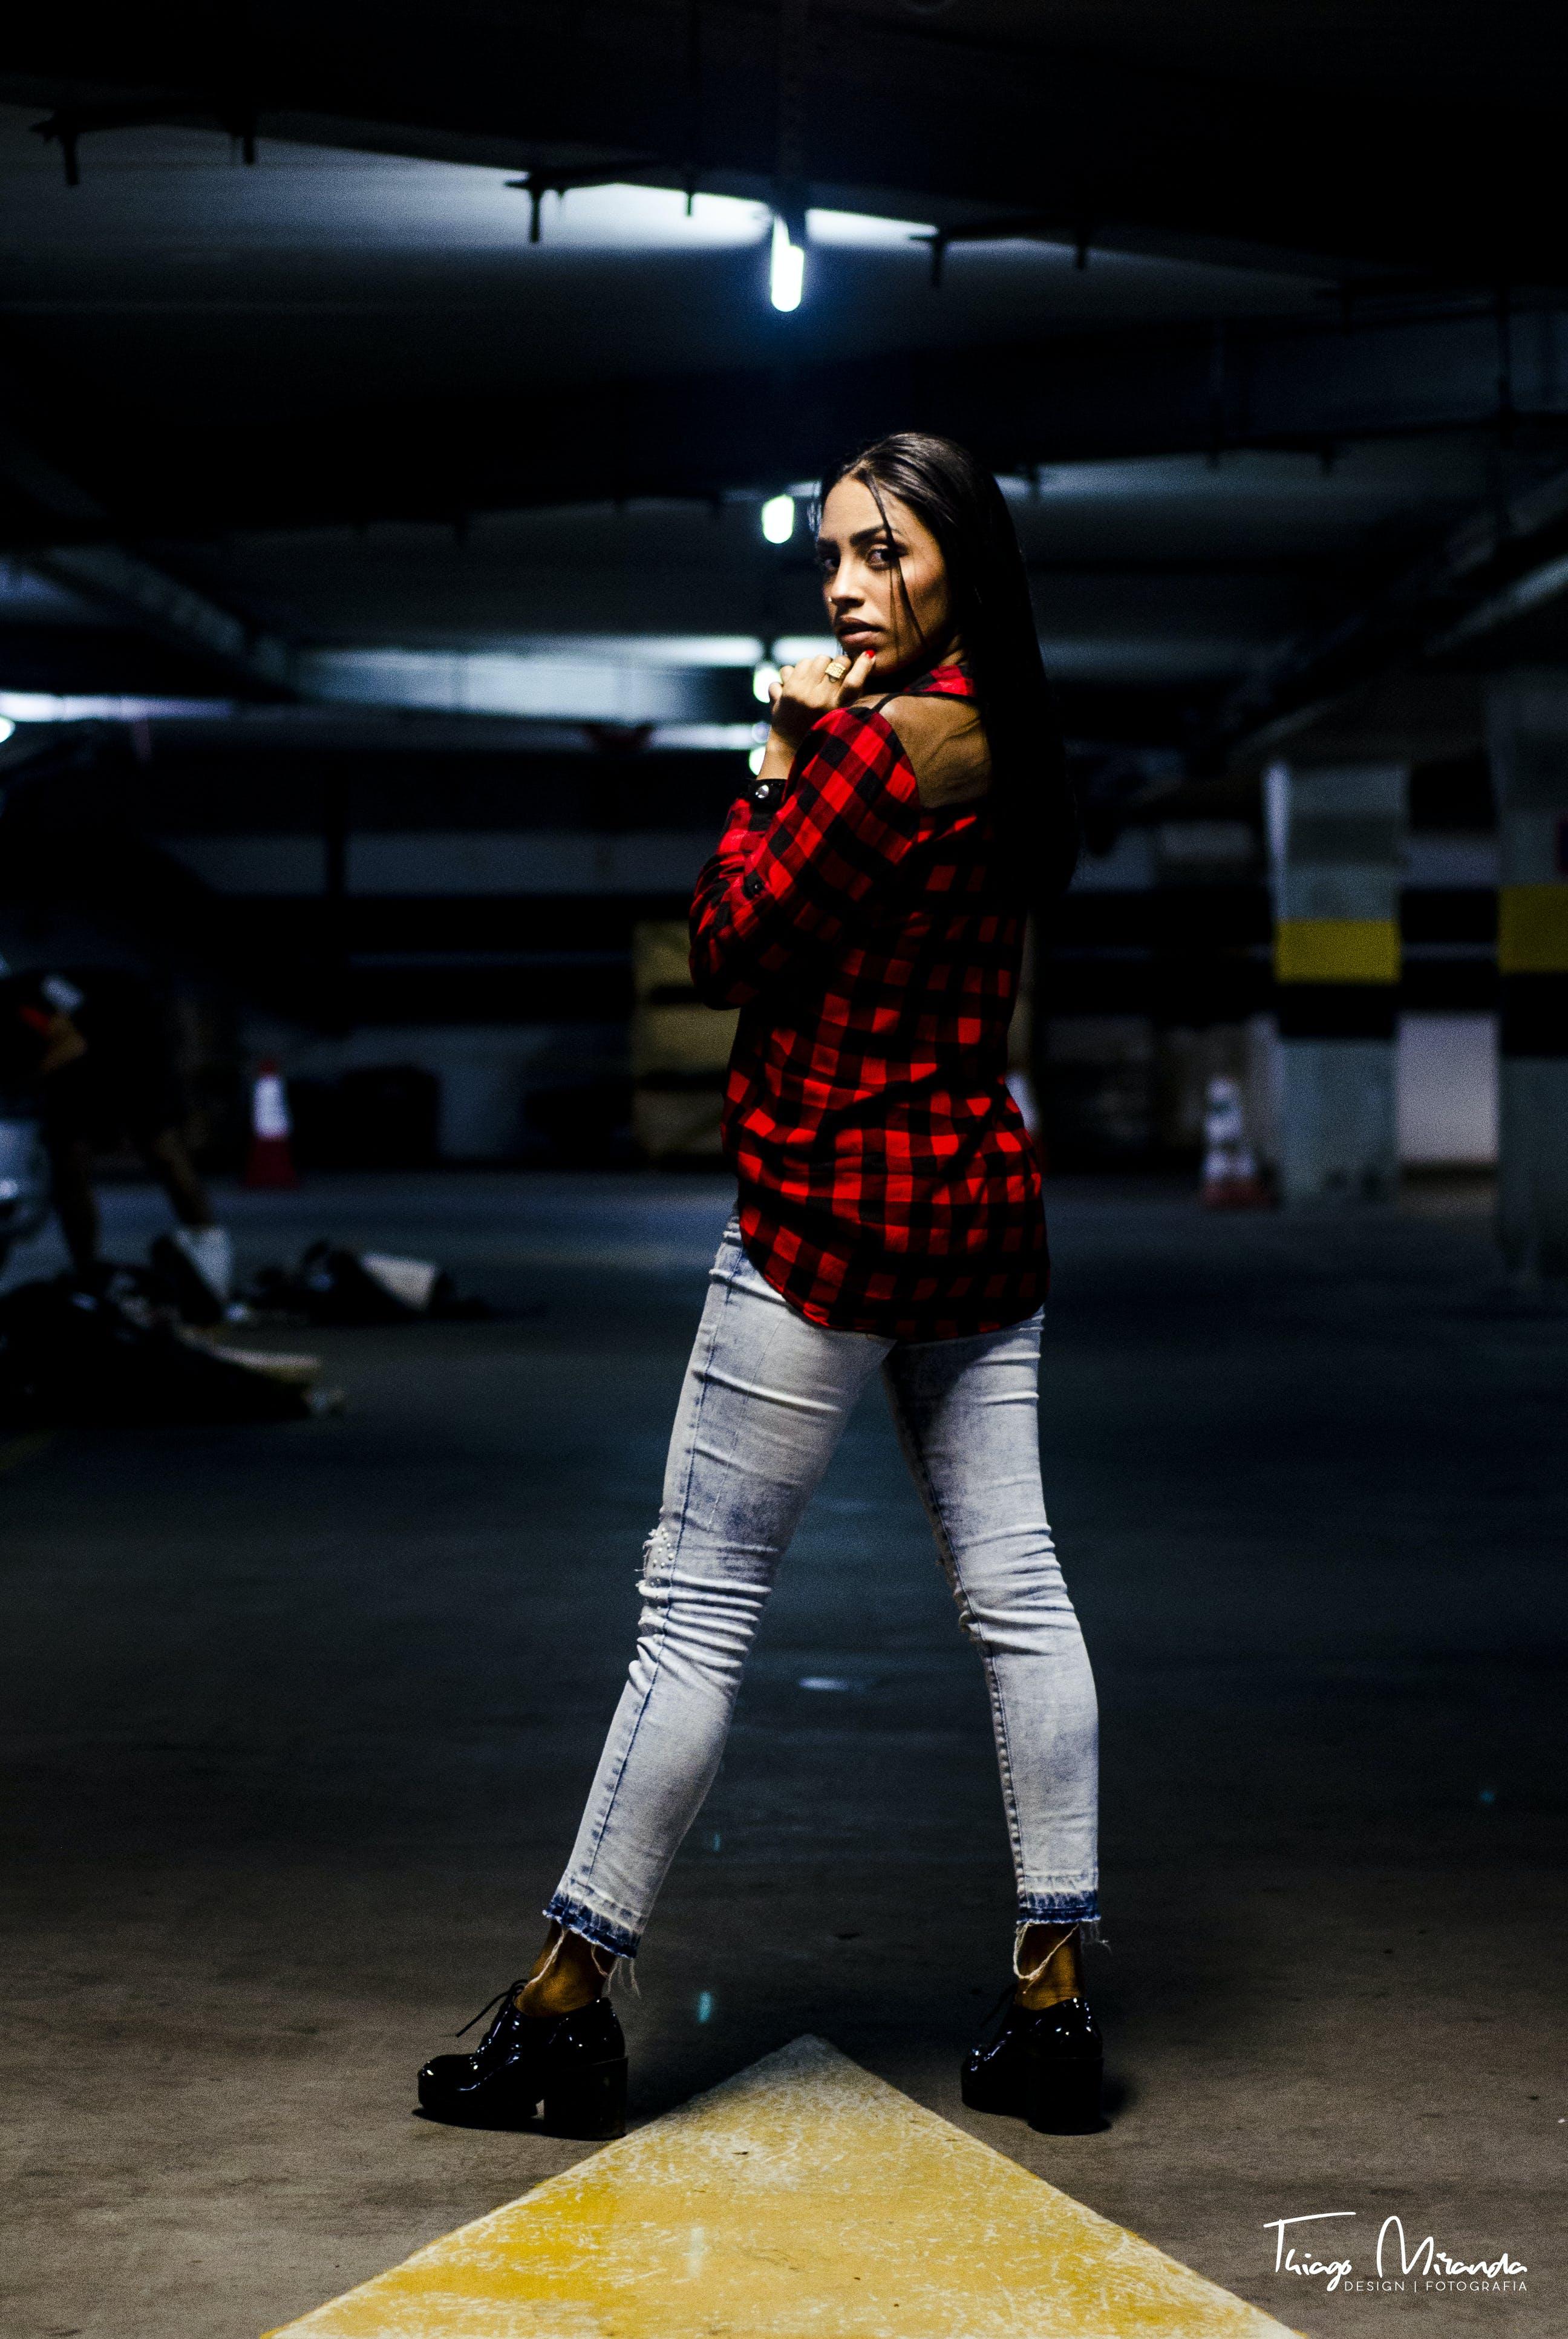 Free stock photo of woman, model, style, urban